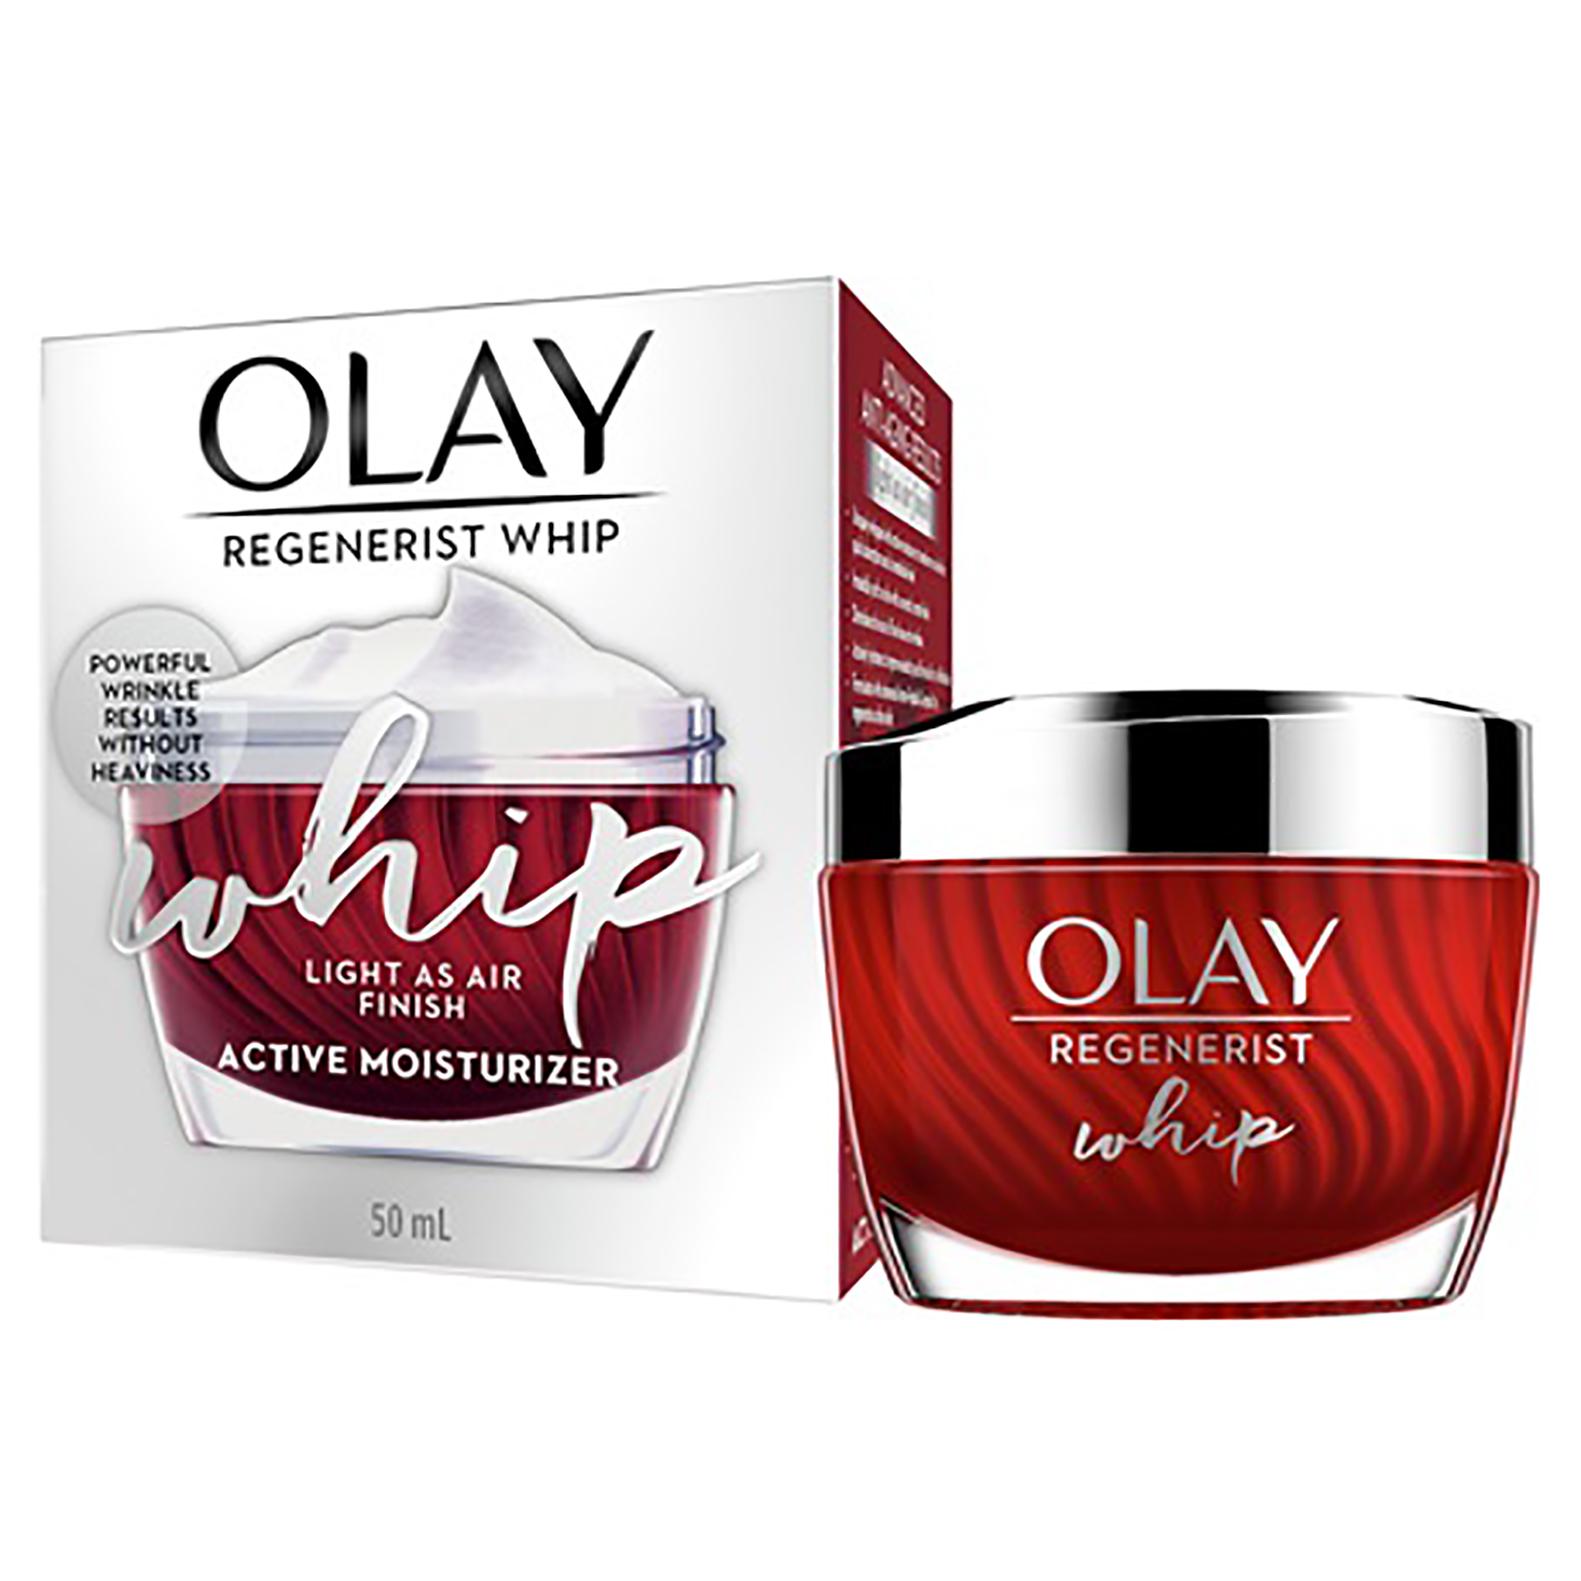 Olay Regenerist Whip Cream 50g